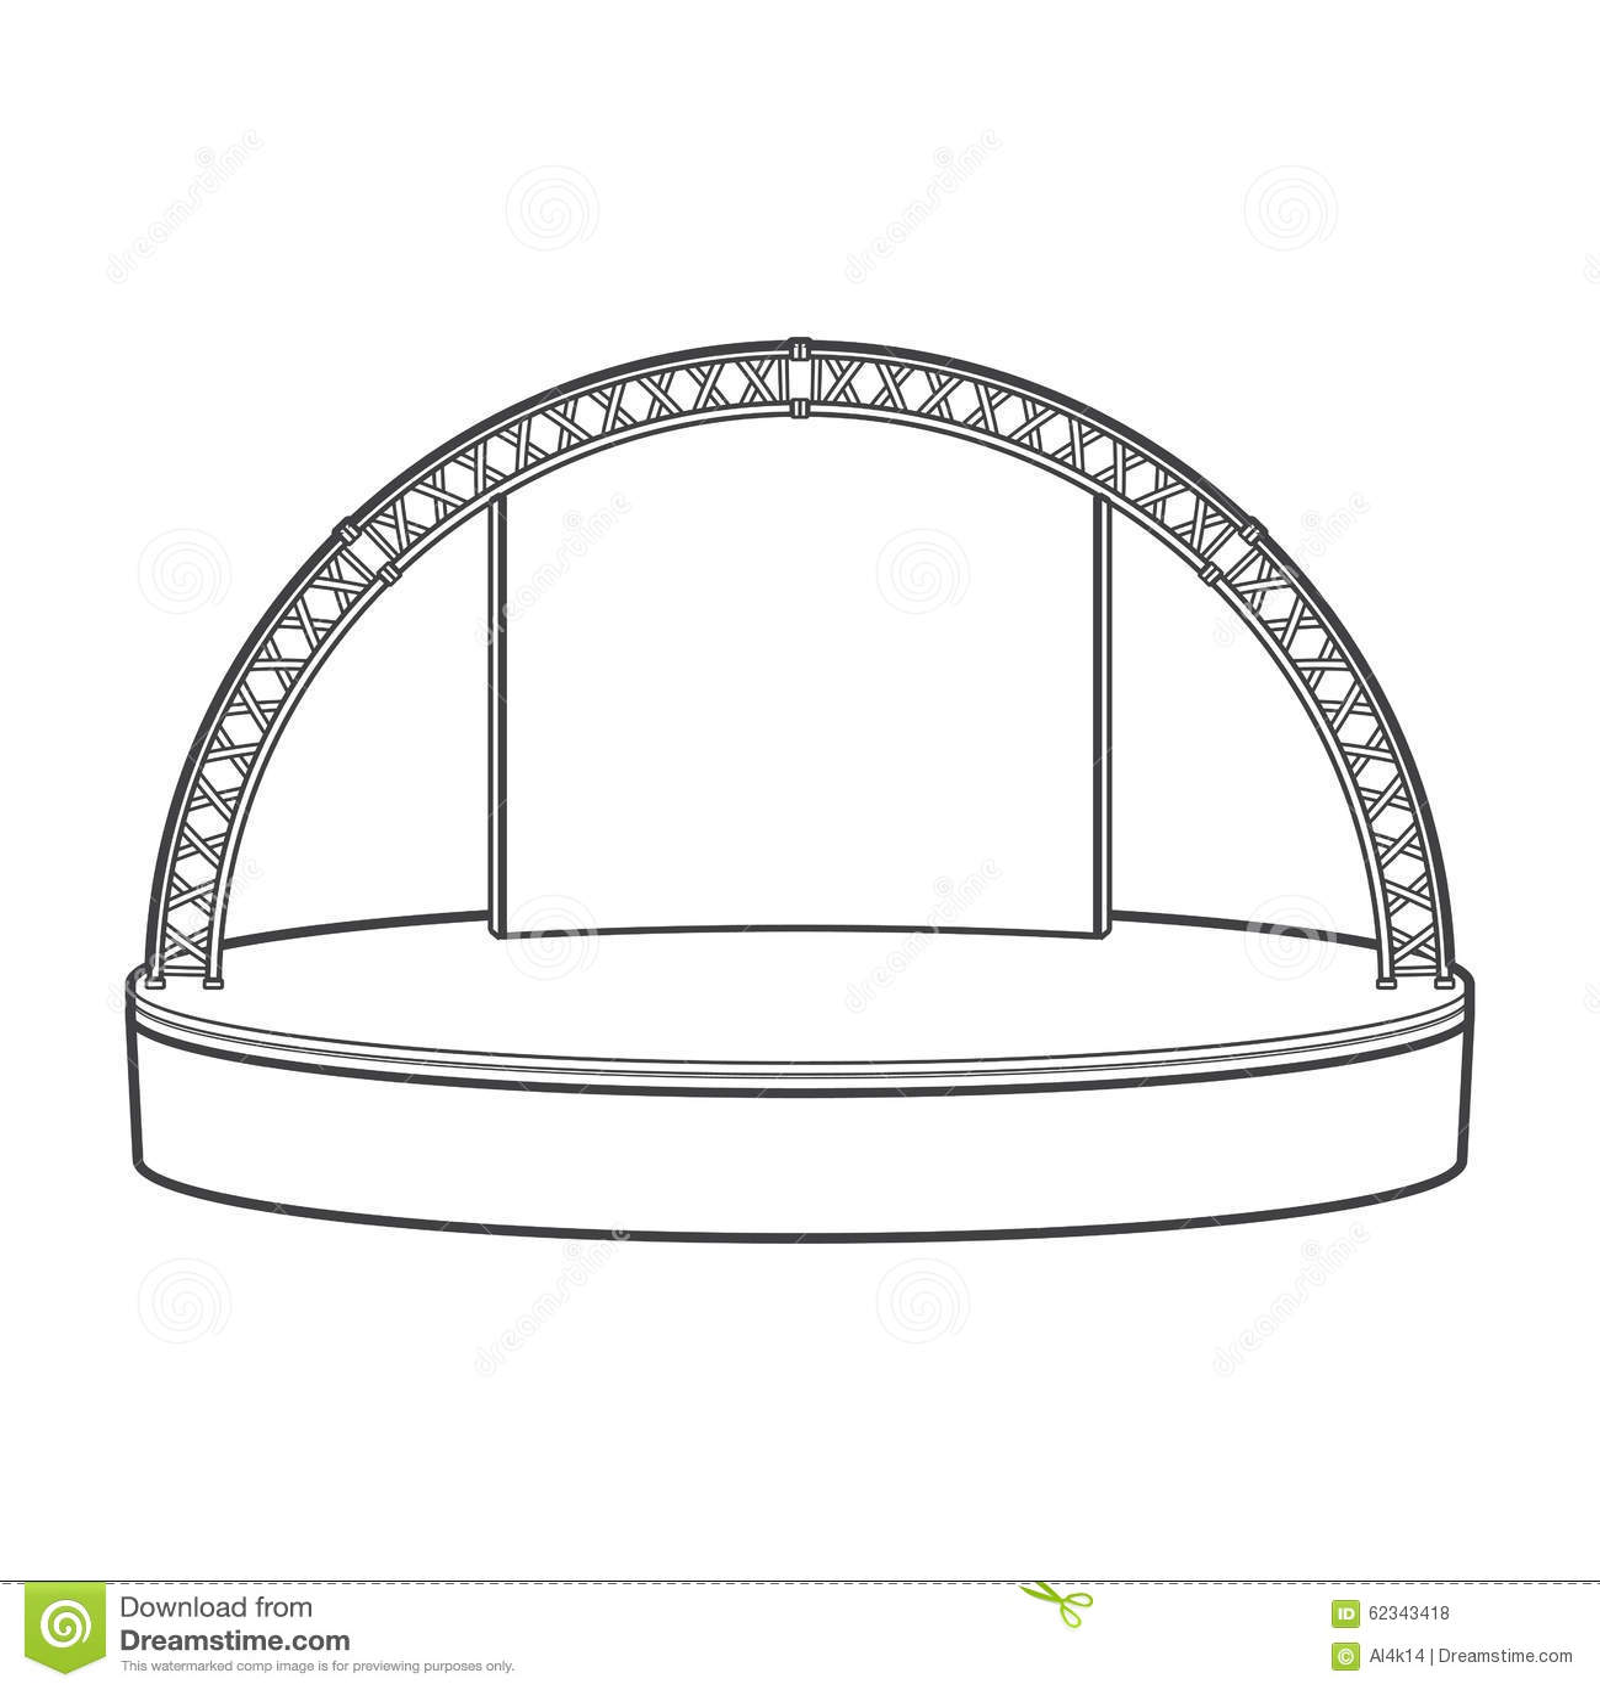 proscenium stage diagram box 4 way round wiring outline dais metal truss illustration stock